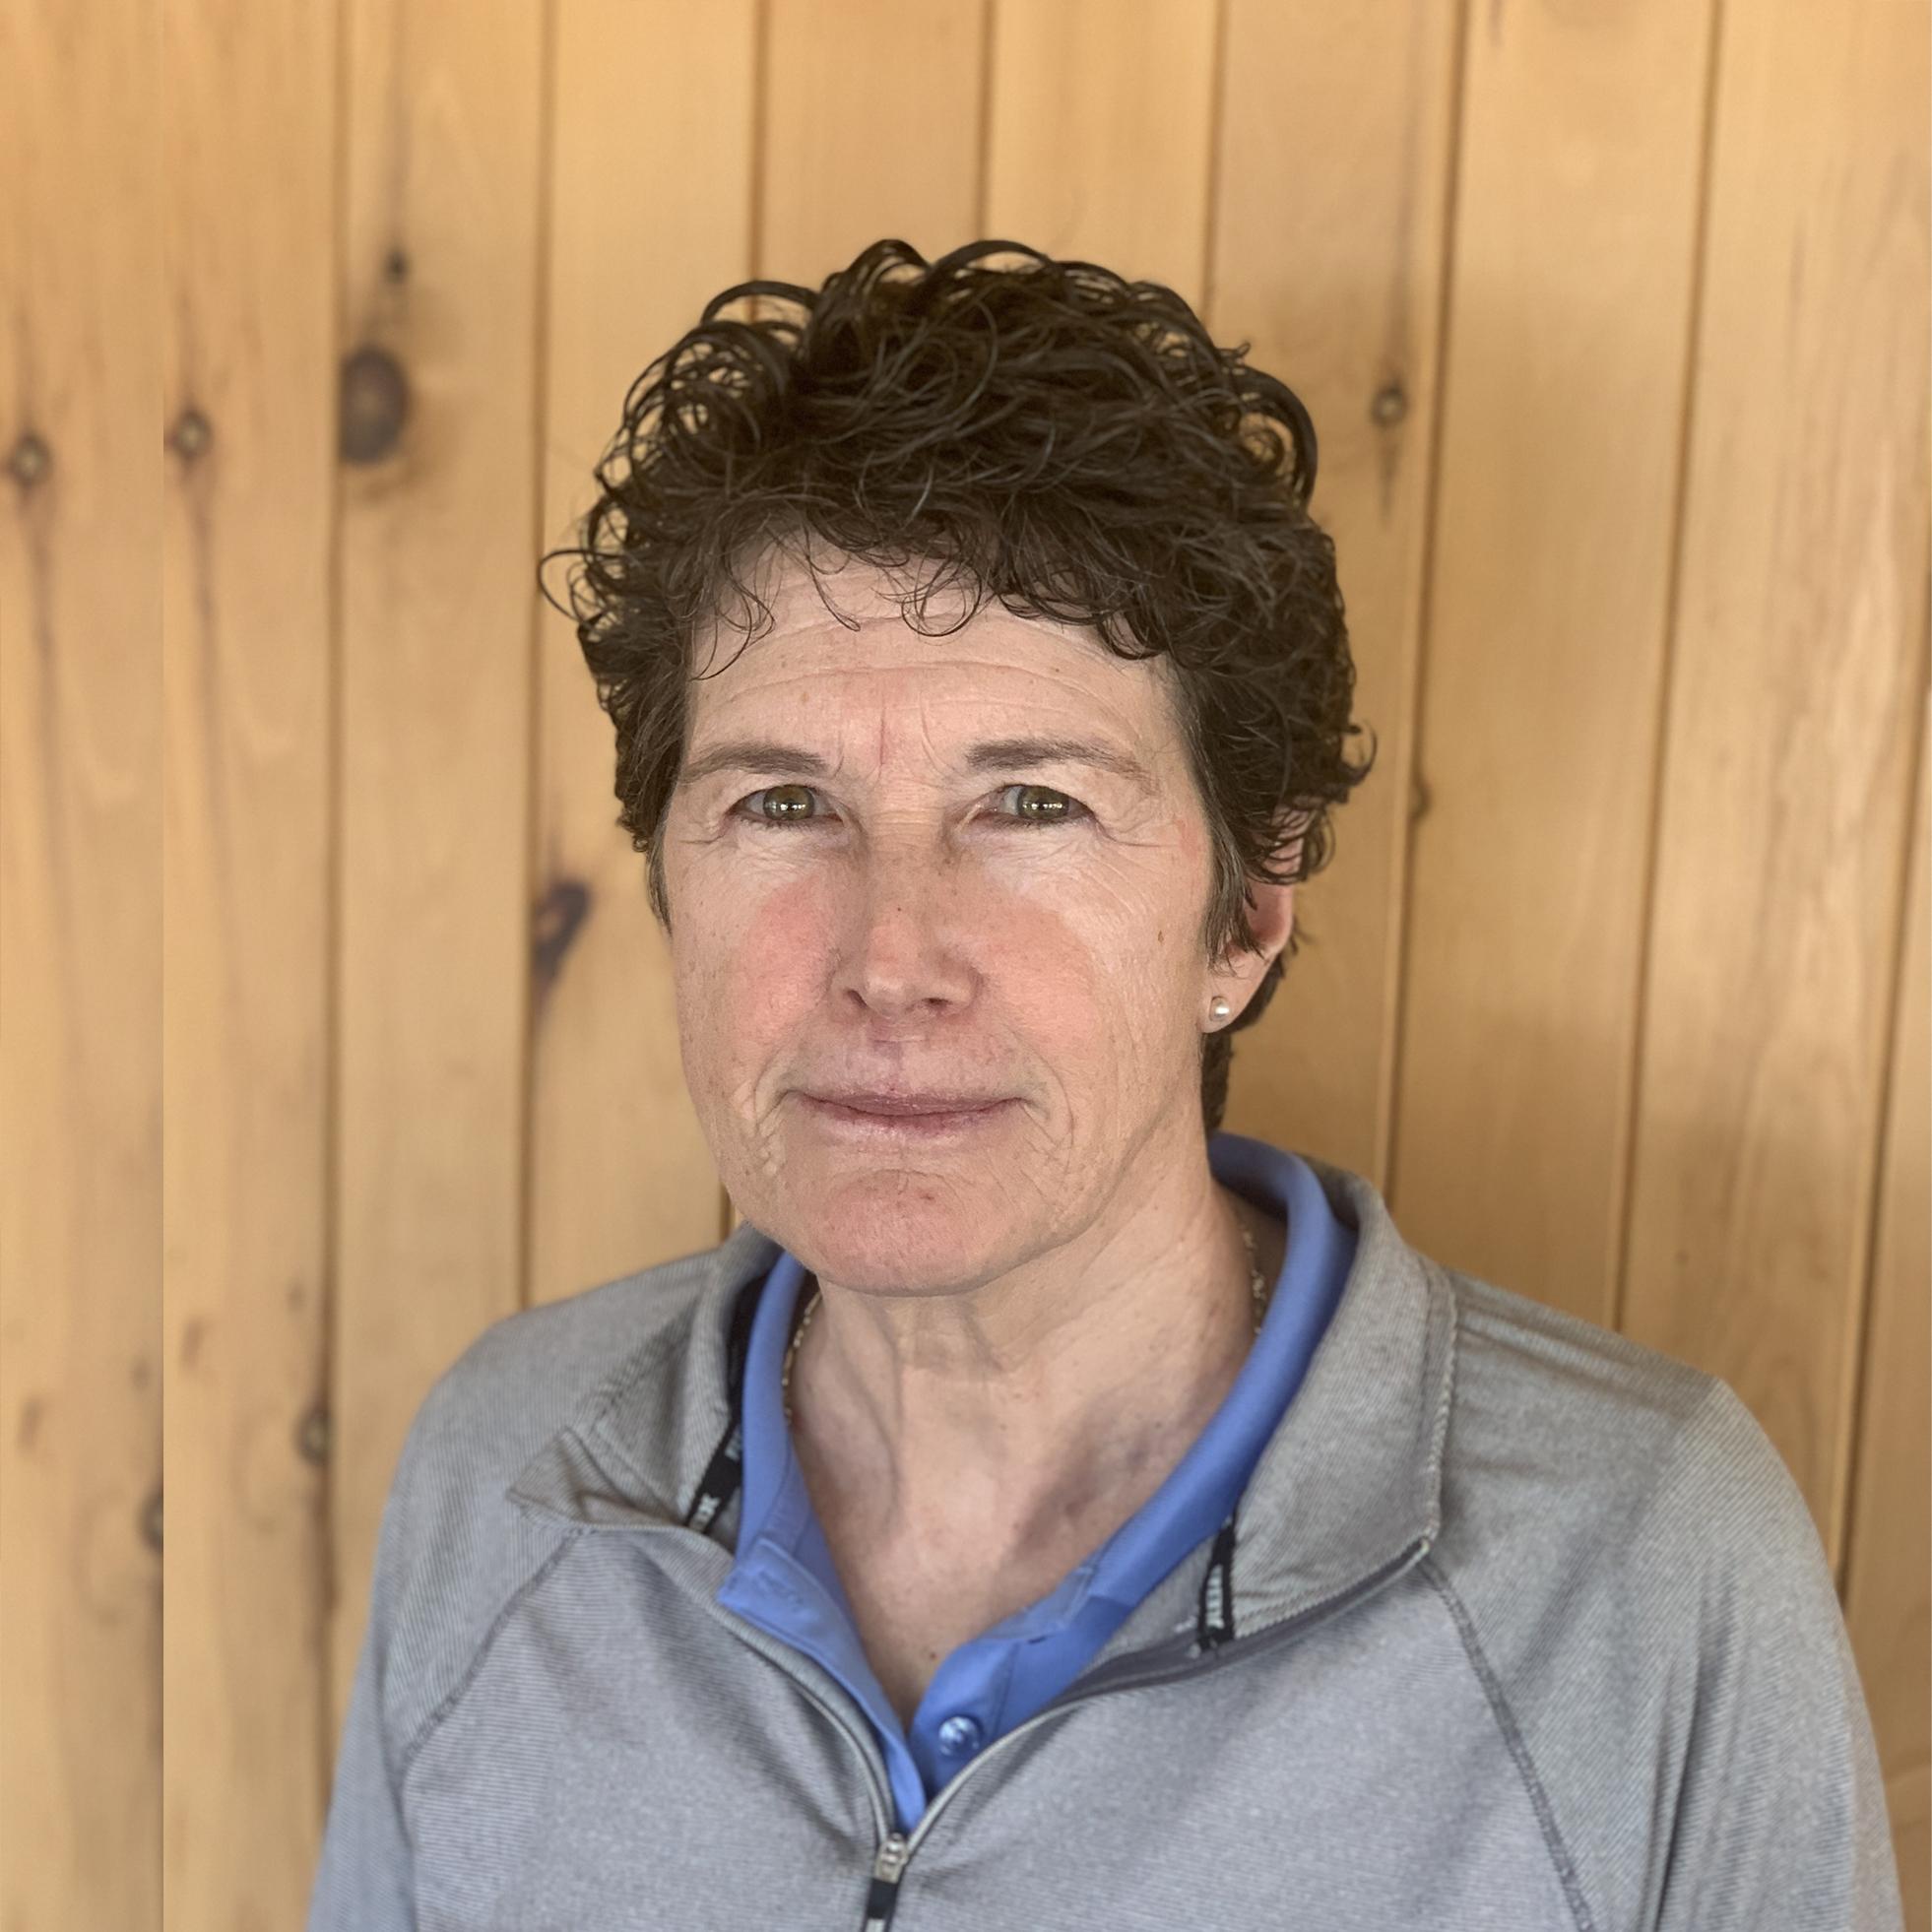 Jocelyn Smith - Club de golf Milby